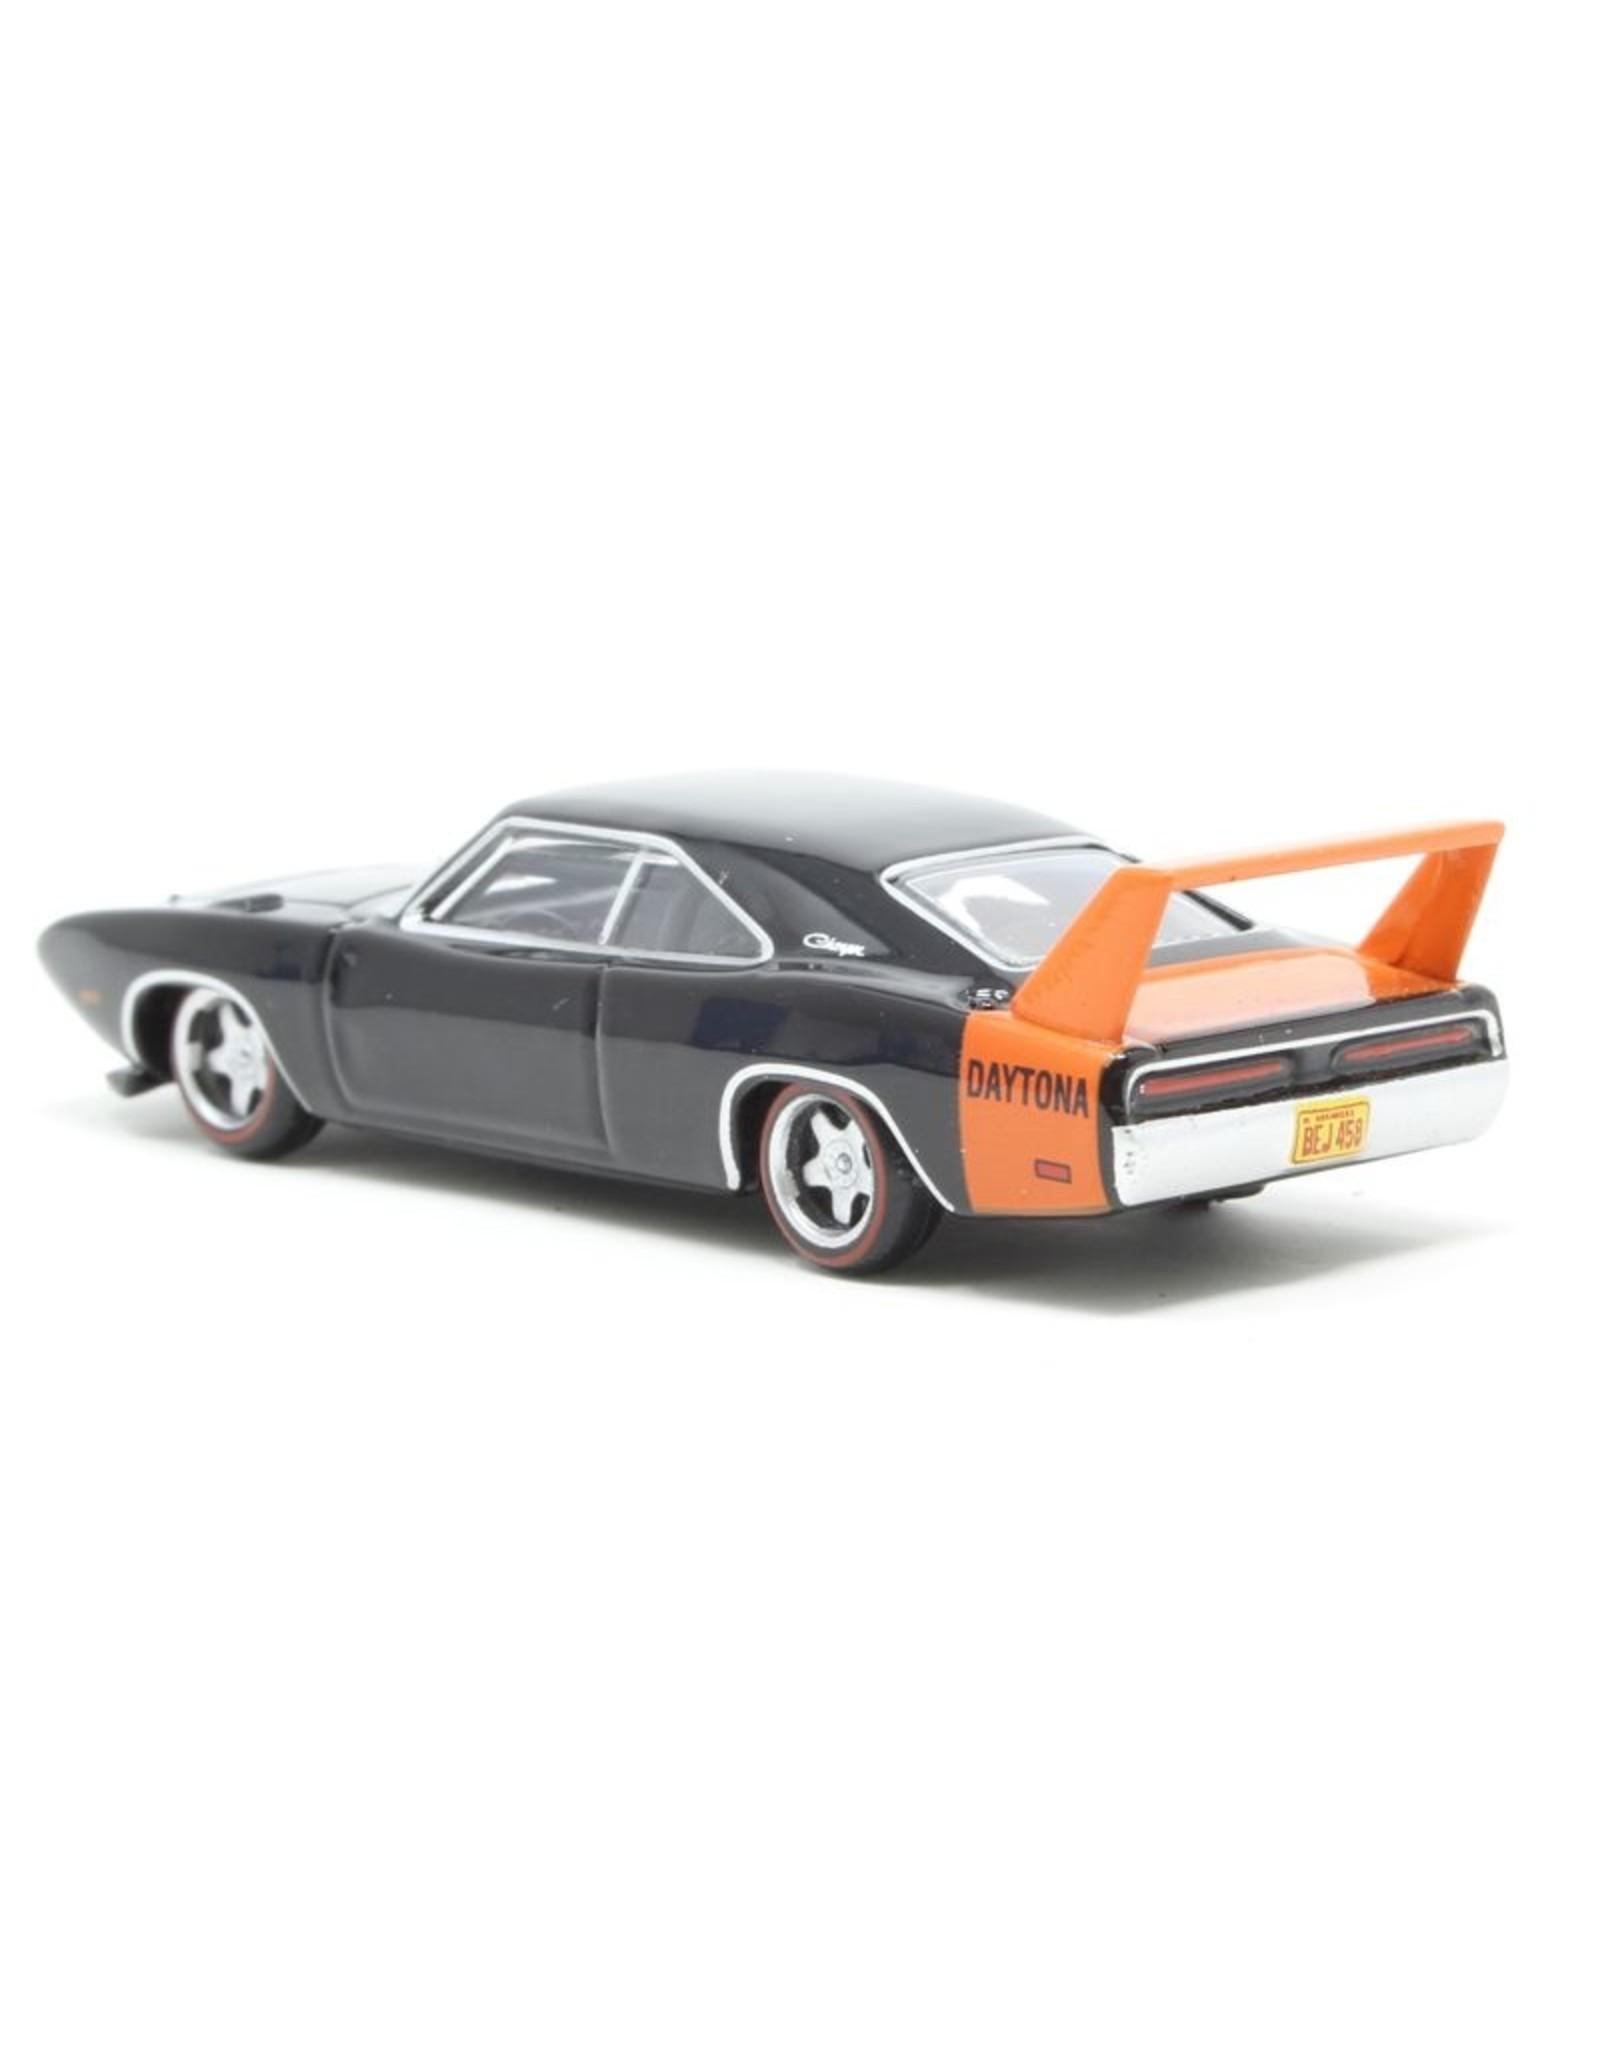 Dodge(Chrysler) DODGE CHARGER DAYTONA(black)